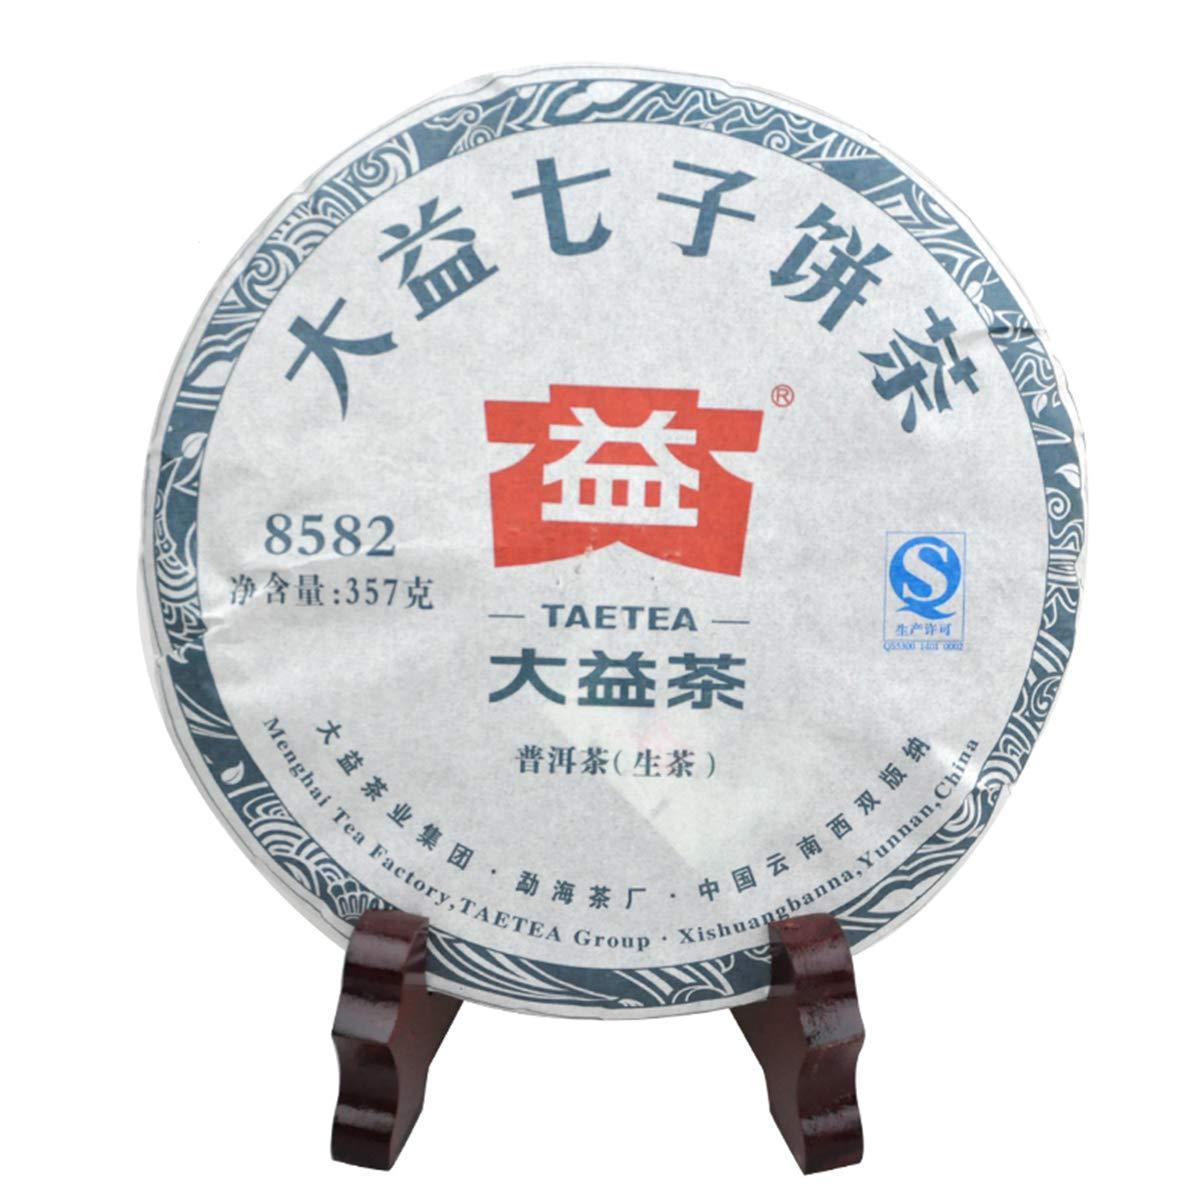 Chinese TAETEA Puerh Raw (Sheng) Dayi Classic Series Yunnan Puer Tea Cake – Original Black Pu'er Gongfu Tea for Weight Loss Health Tea (Mark No. 8582, Aged 2016)